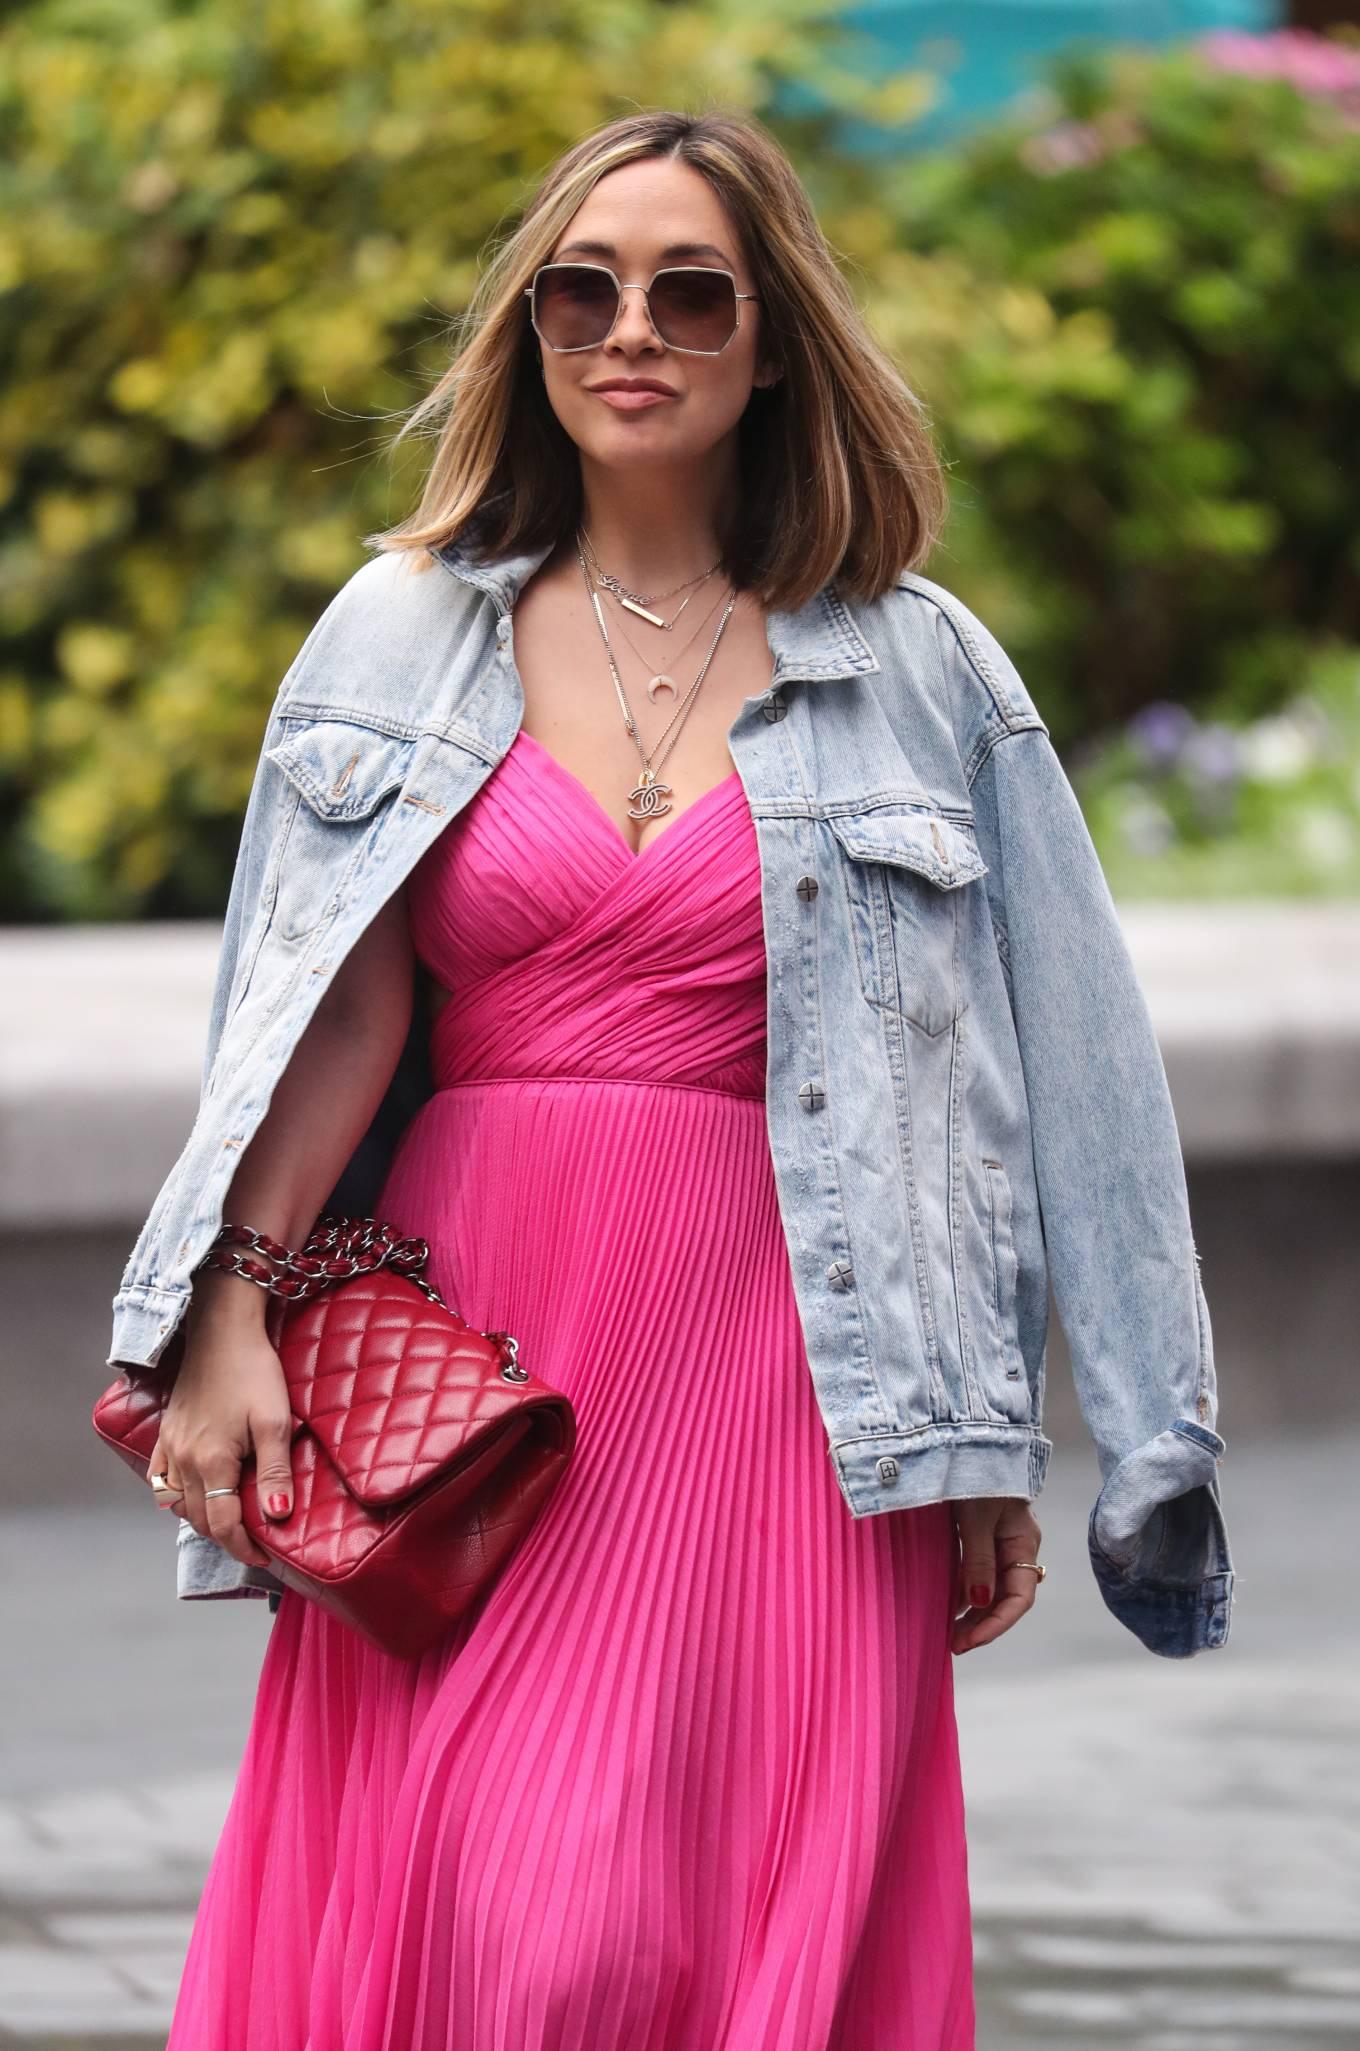 Myleene Klass in Long Pink Dress - Arriving at Smooth Radio in London